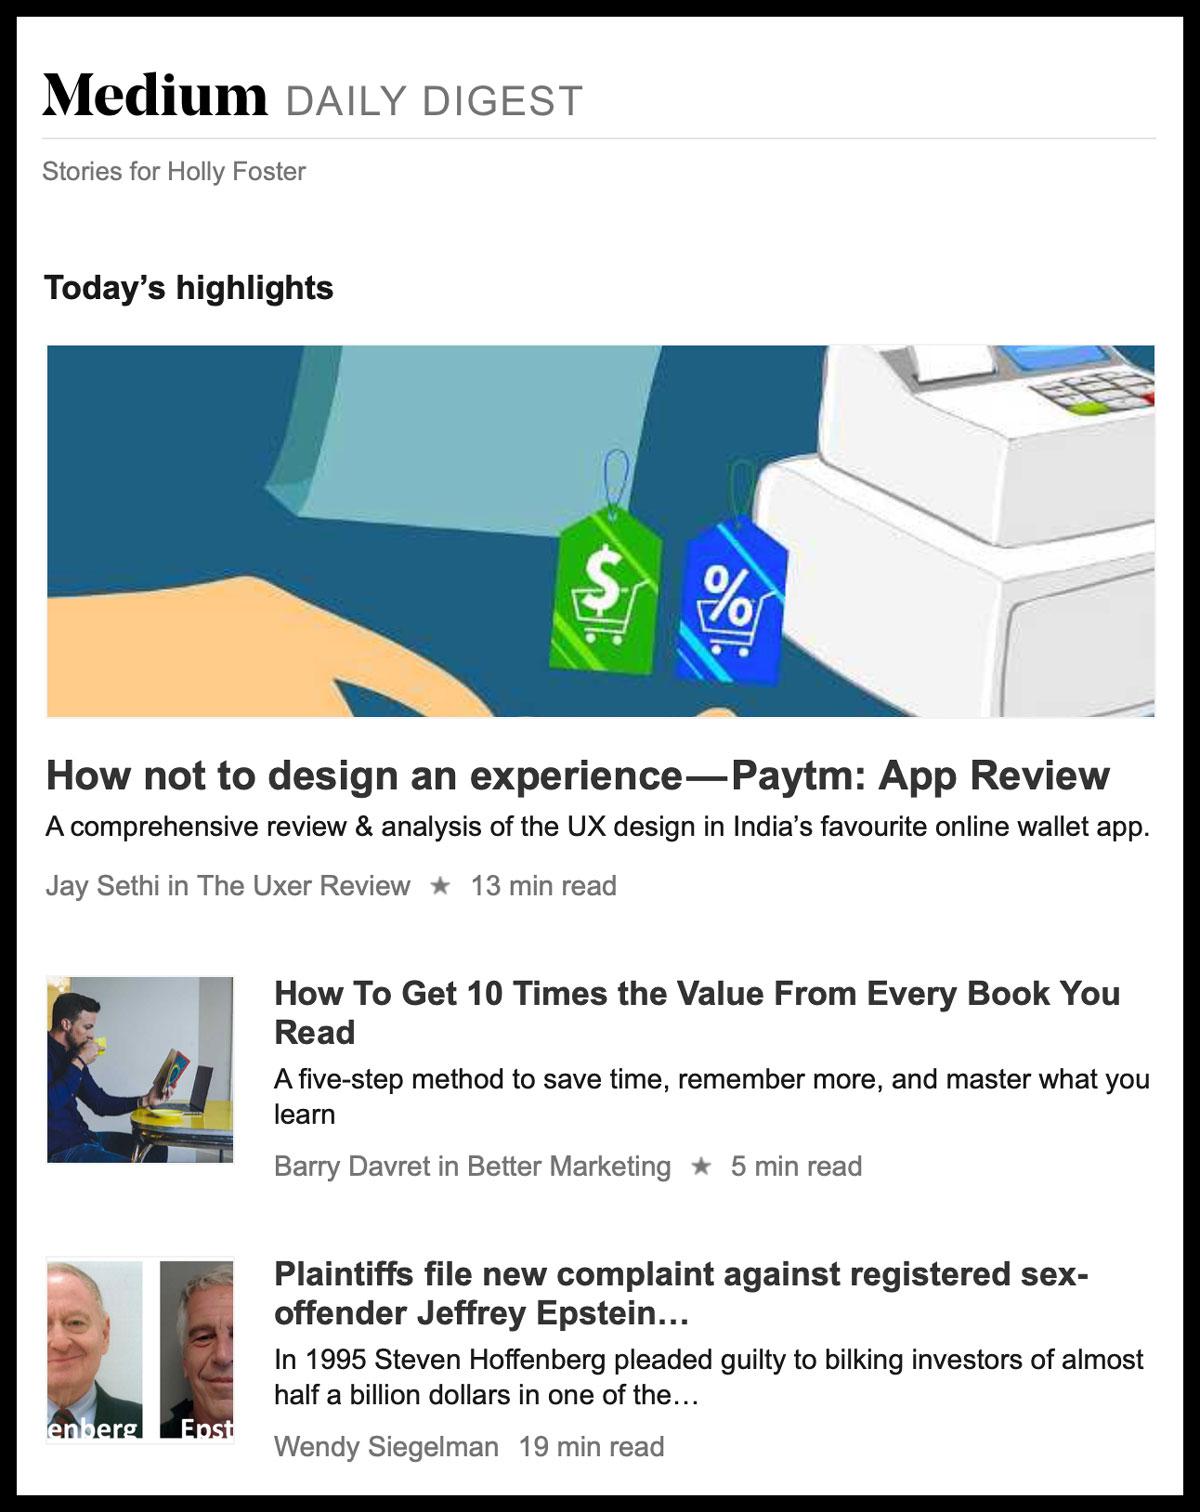 Image of Medium.com Daily Digest email